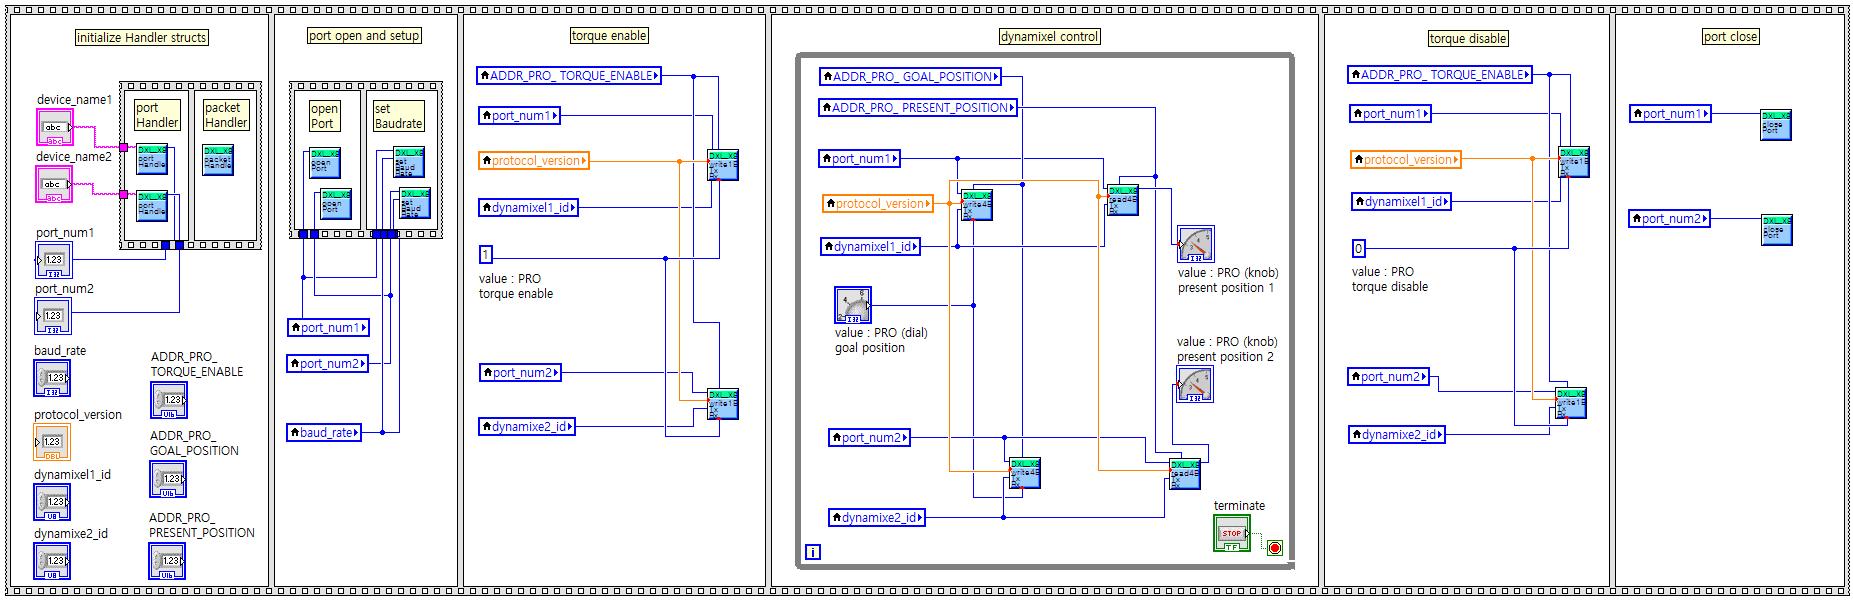 Dynamixelsdk Block Diagram Labview Multi Port Protocol 20